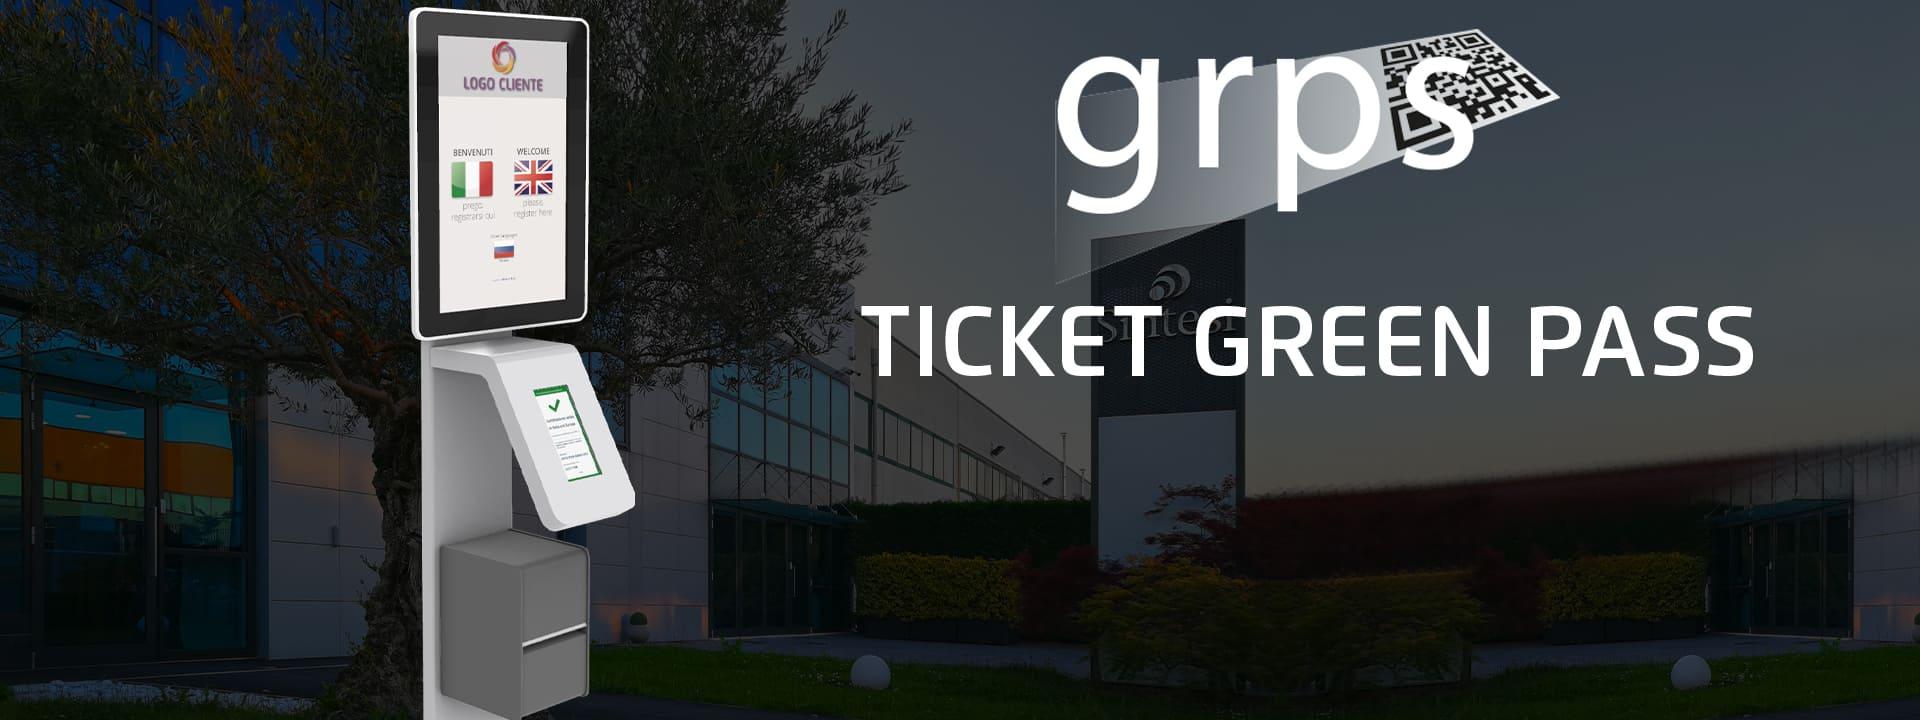 grps-ticket-green-pass